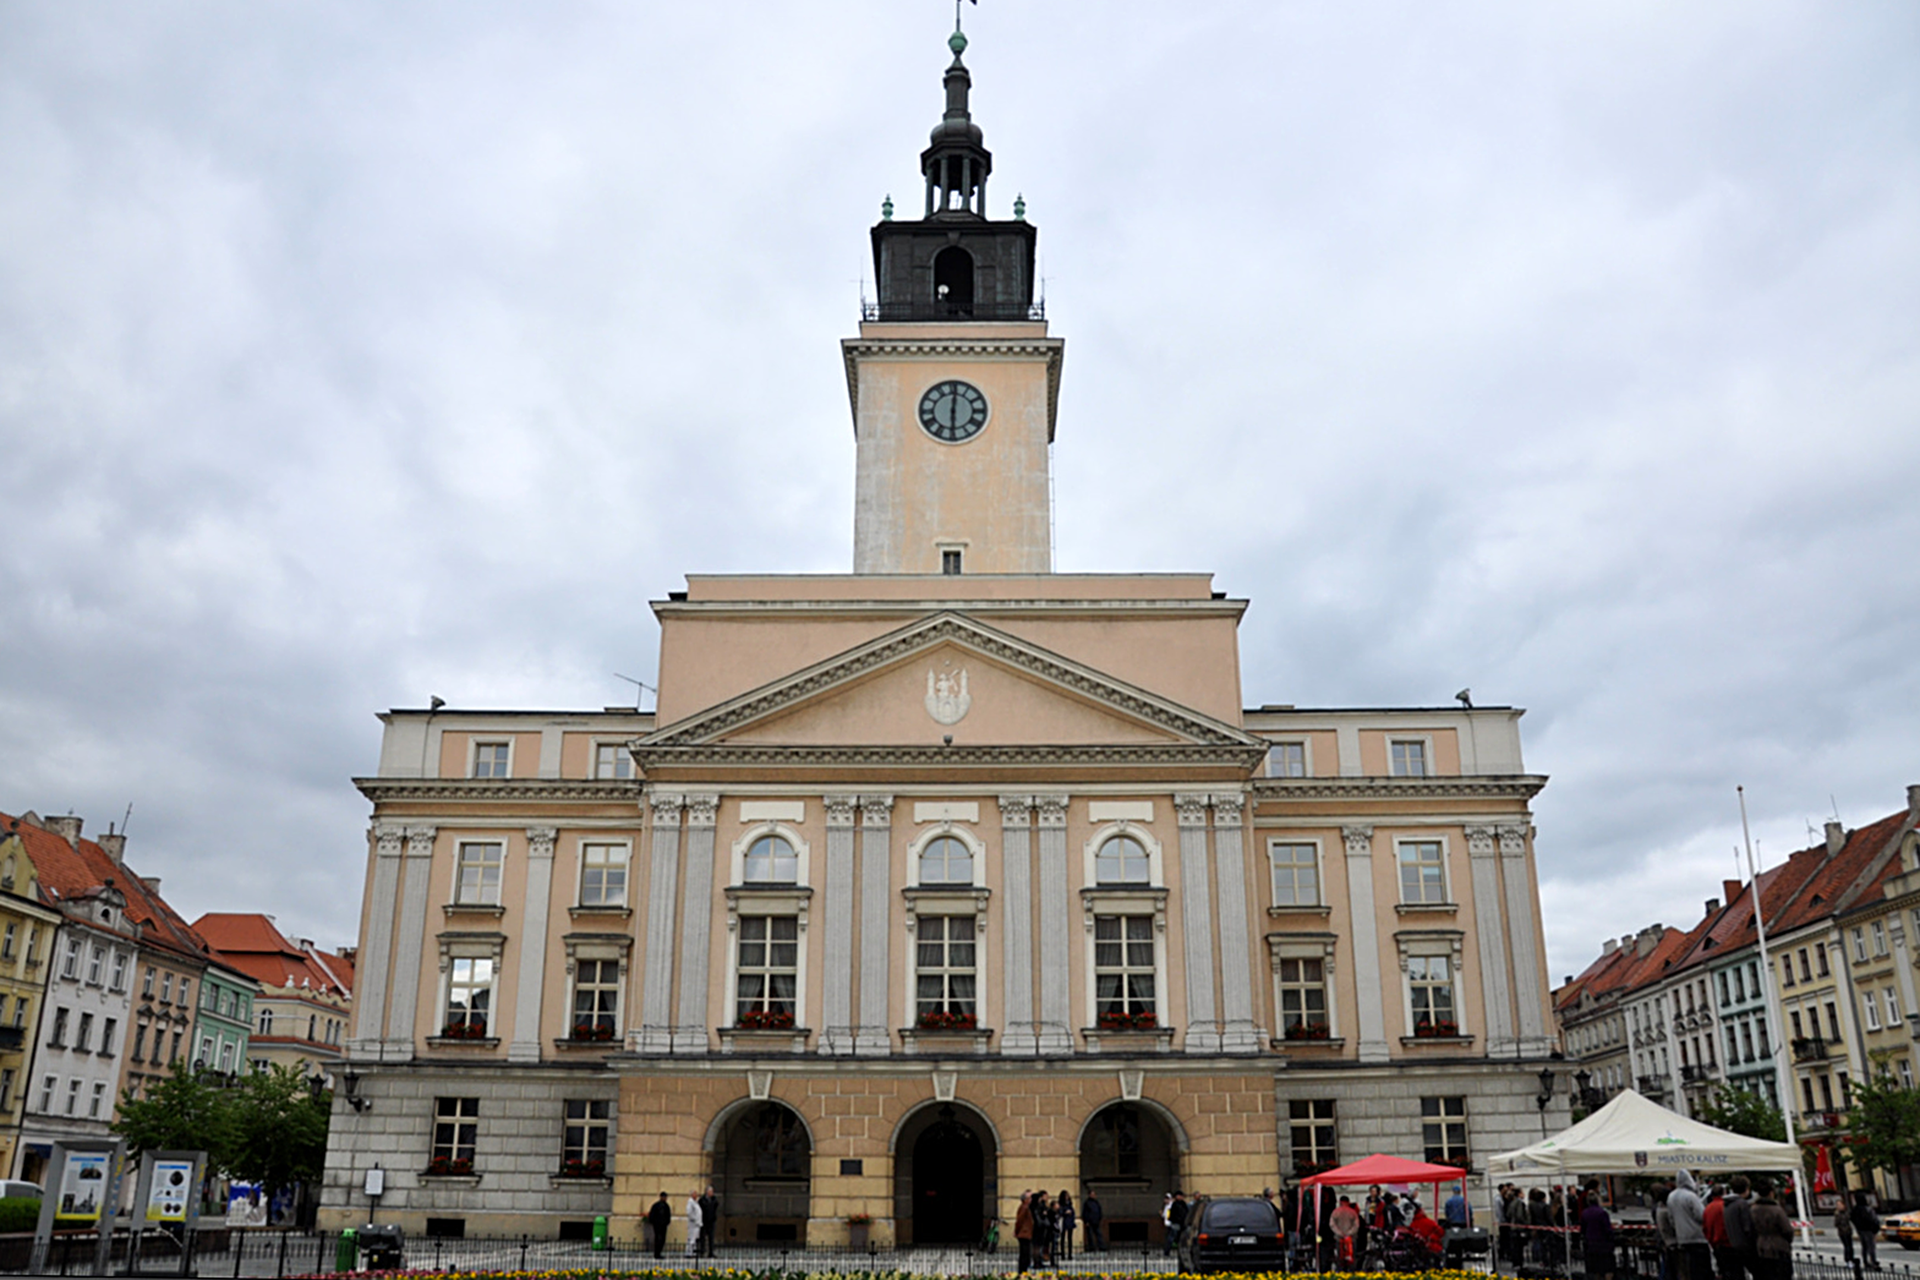 Fotografia prezentująca Ratusz miasta wKaliszu.